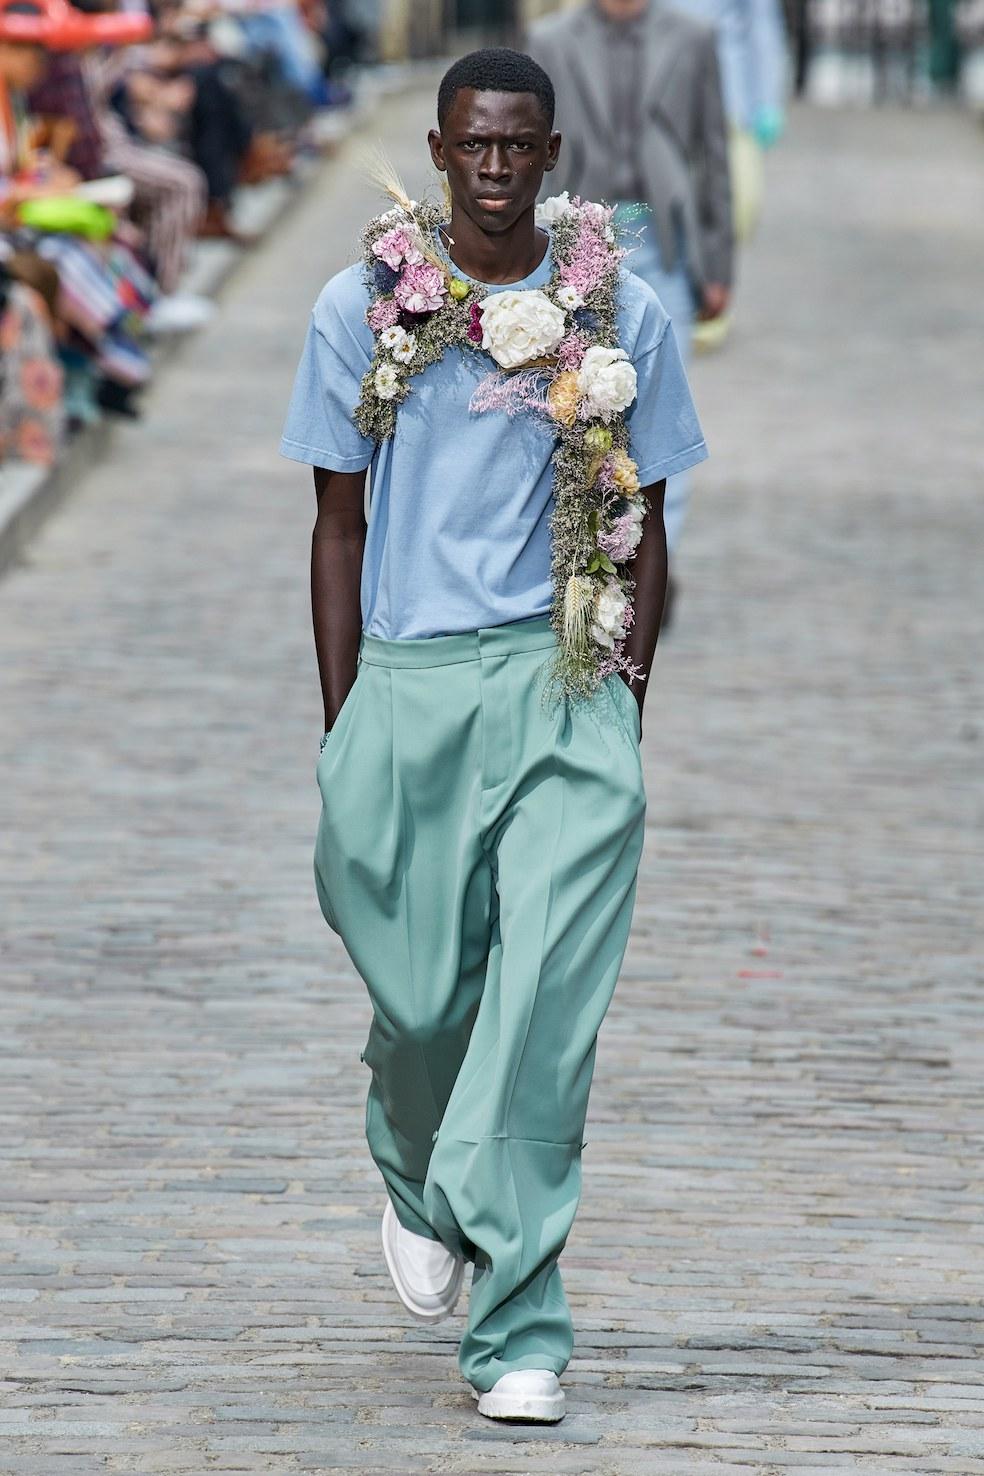 Louis_Vuitton_SS20_Behind_The_Blinds_Magazine__FIO0127.jpg